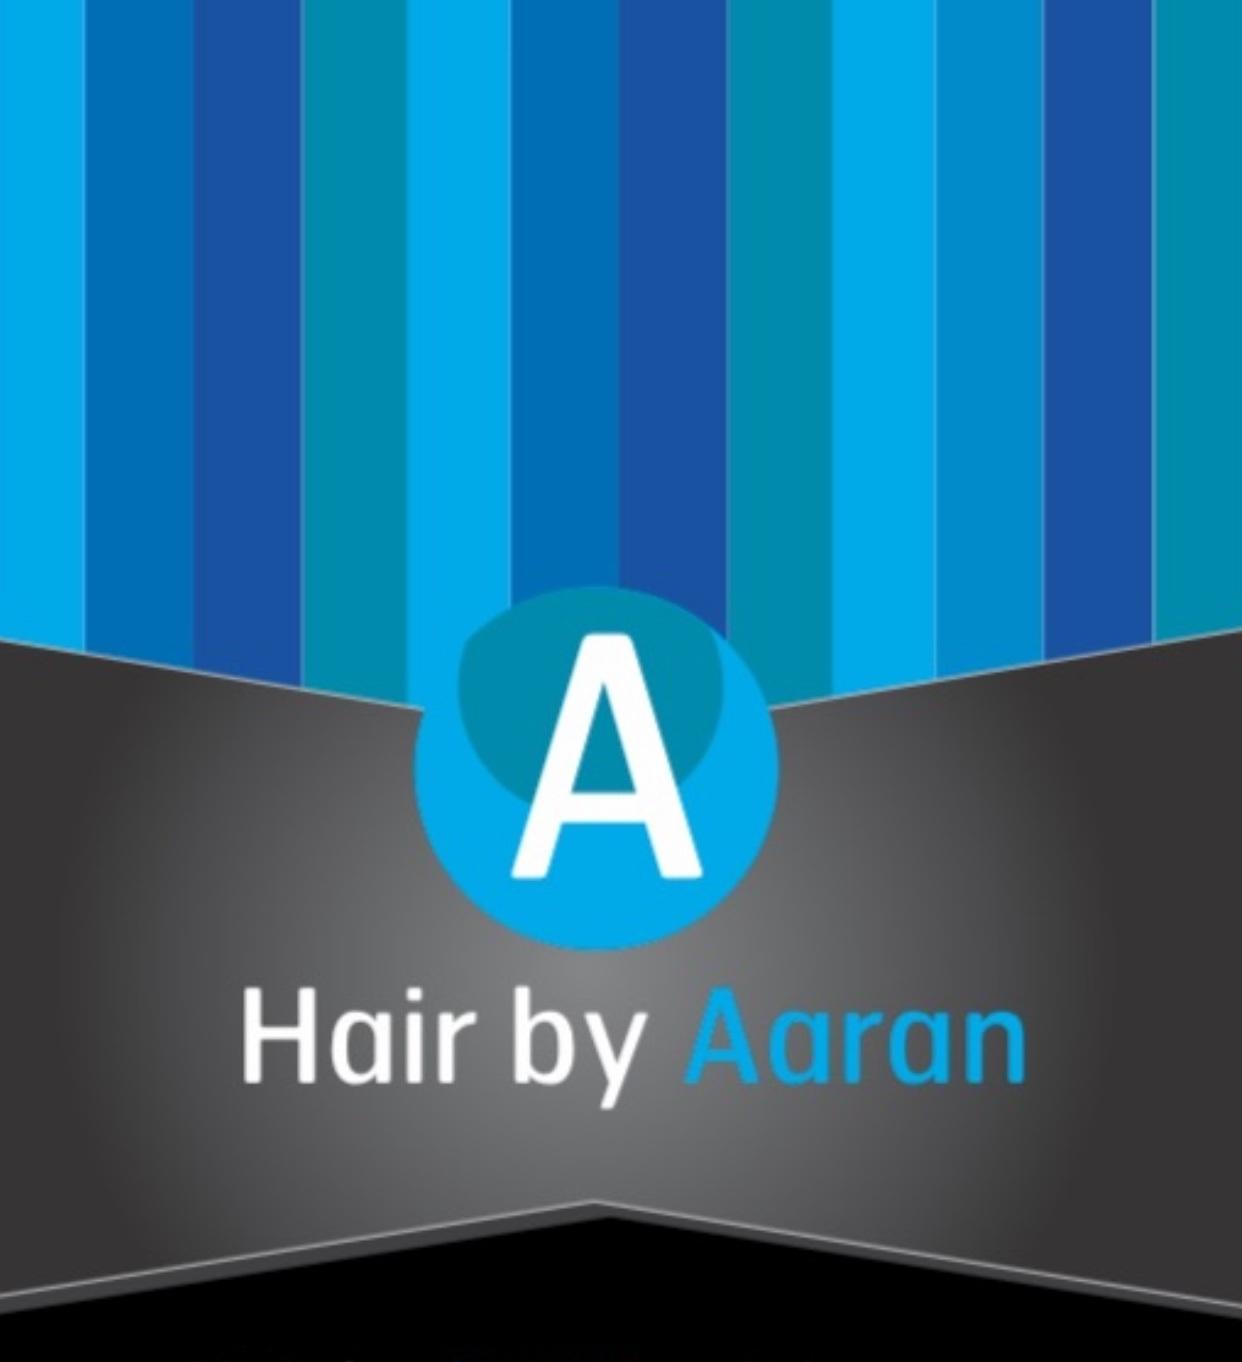 -HAIR BY AARAN @ FLORESCENCE